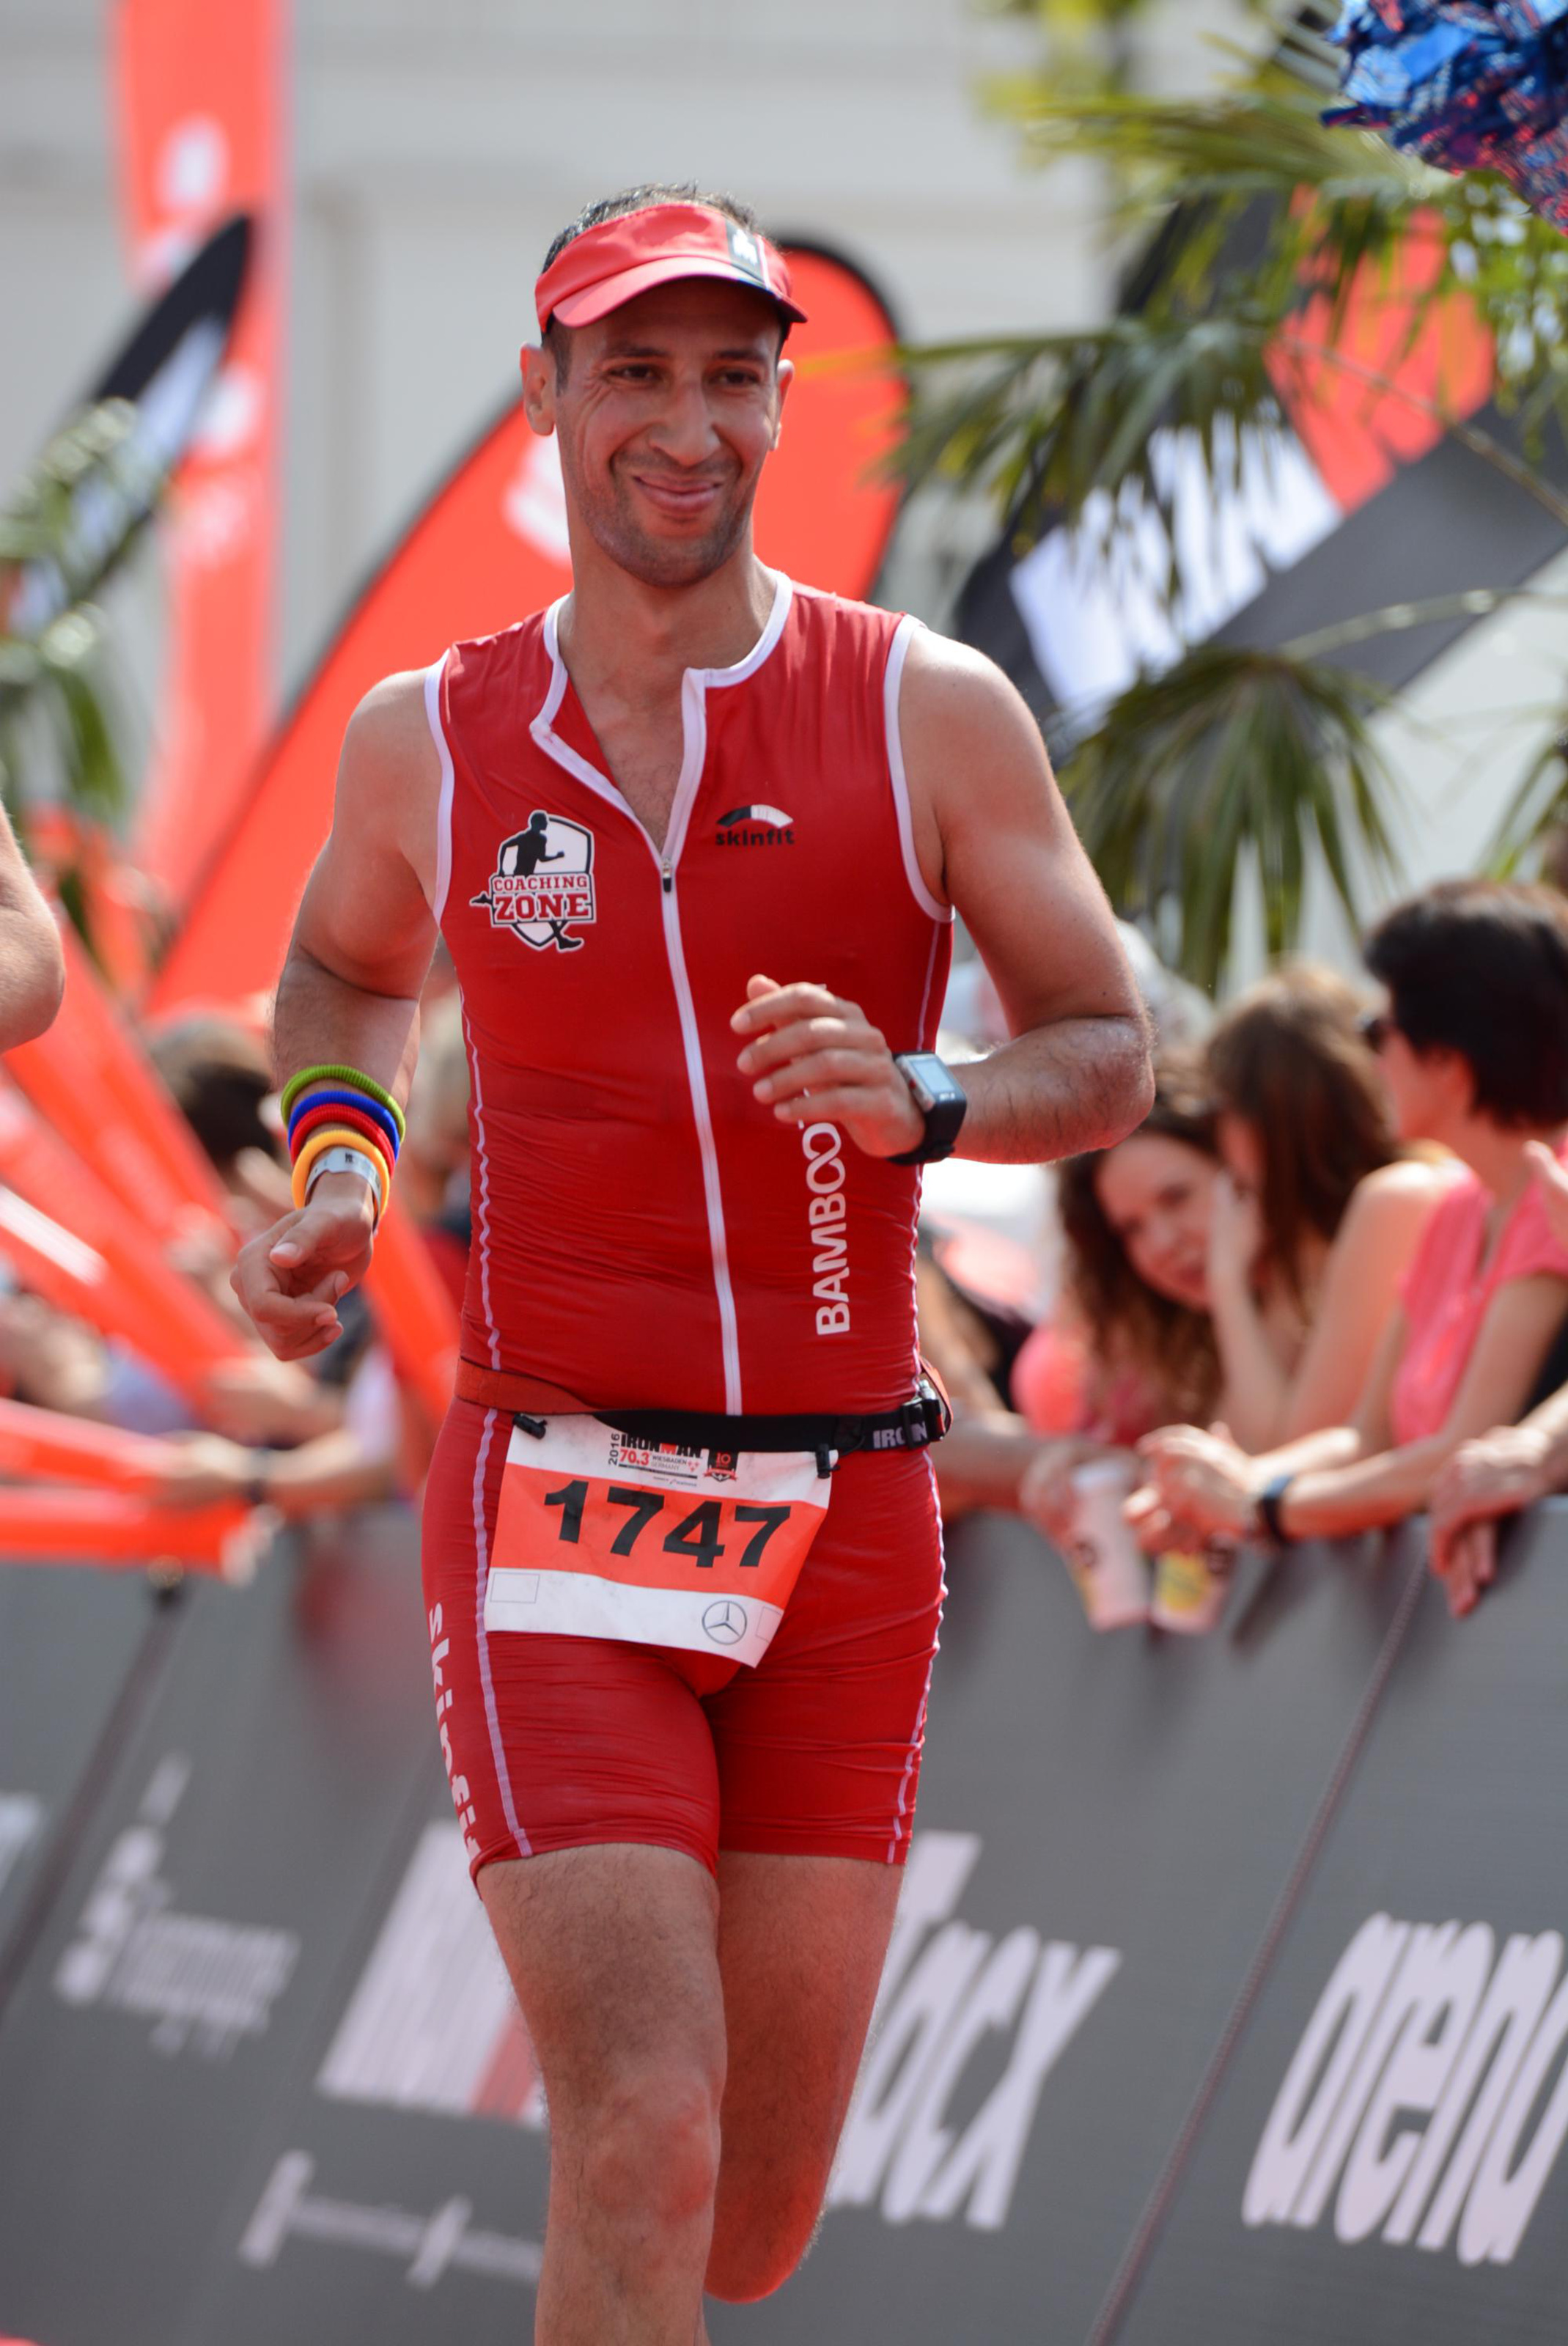 Ironman 70.3 Wiesbaden 2016 - Finish line.